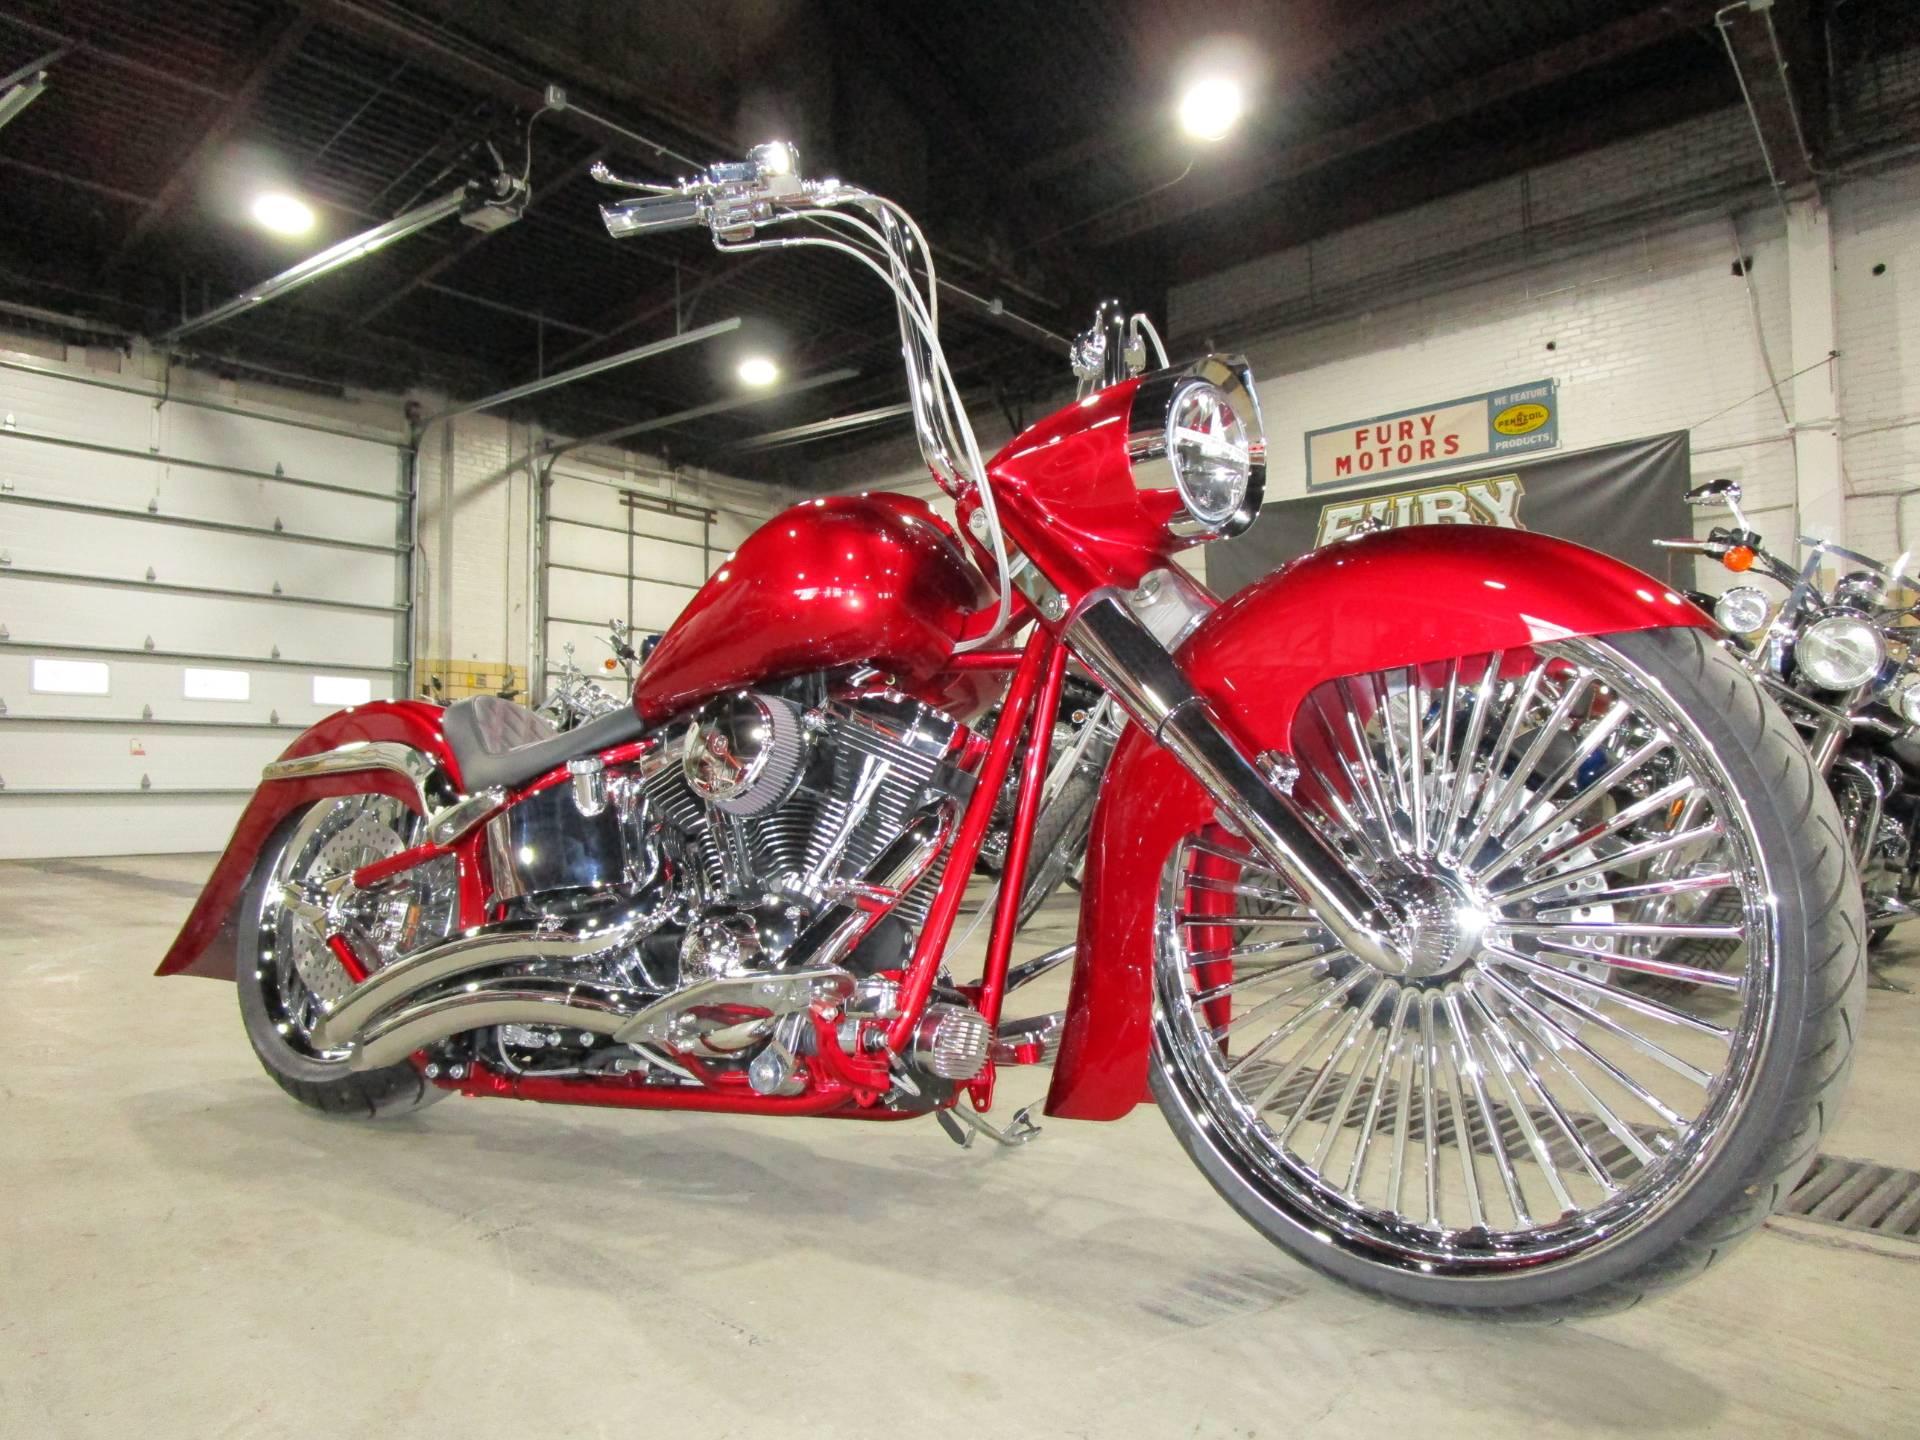 2014 Harley-Davidson Softail for sale 15080